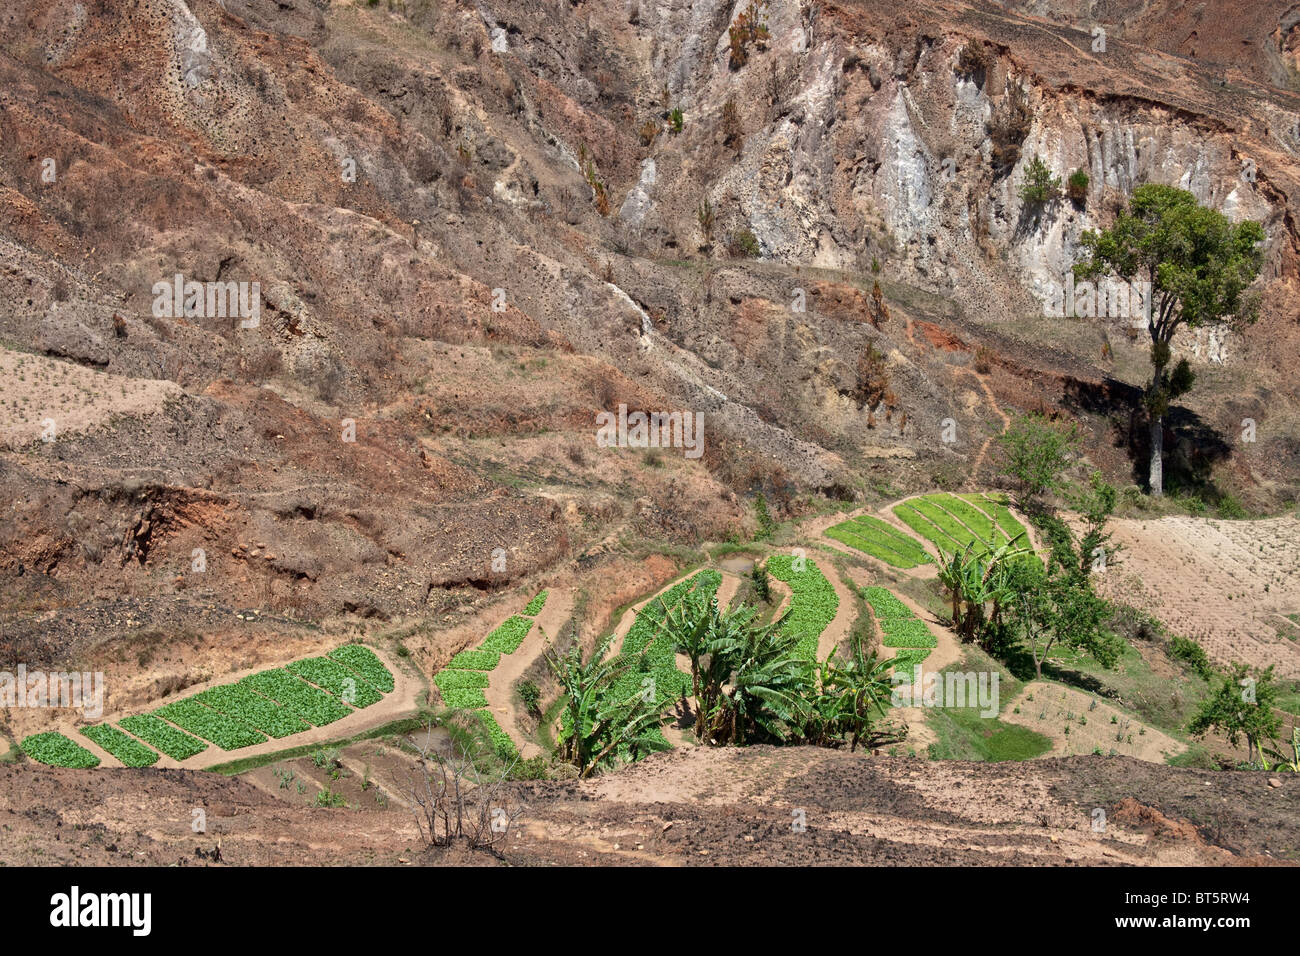 Agricoltura in valle, Analamanga, Madagascar. Immagini Stock